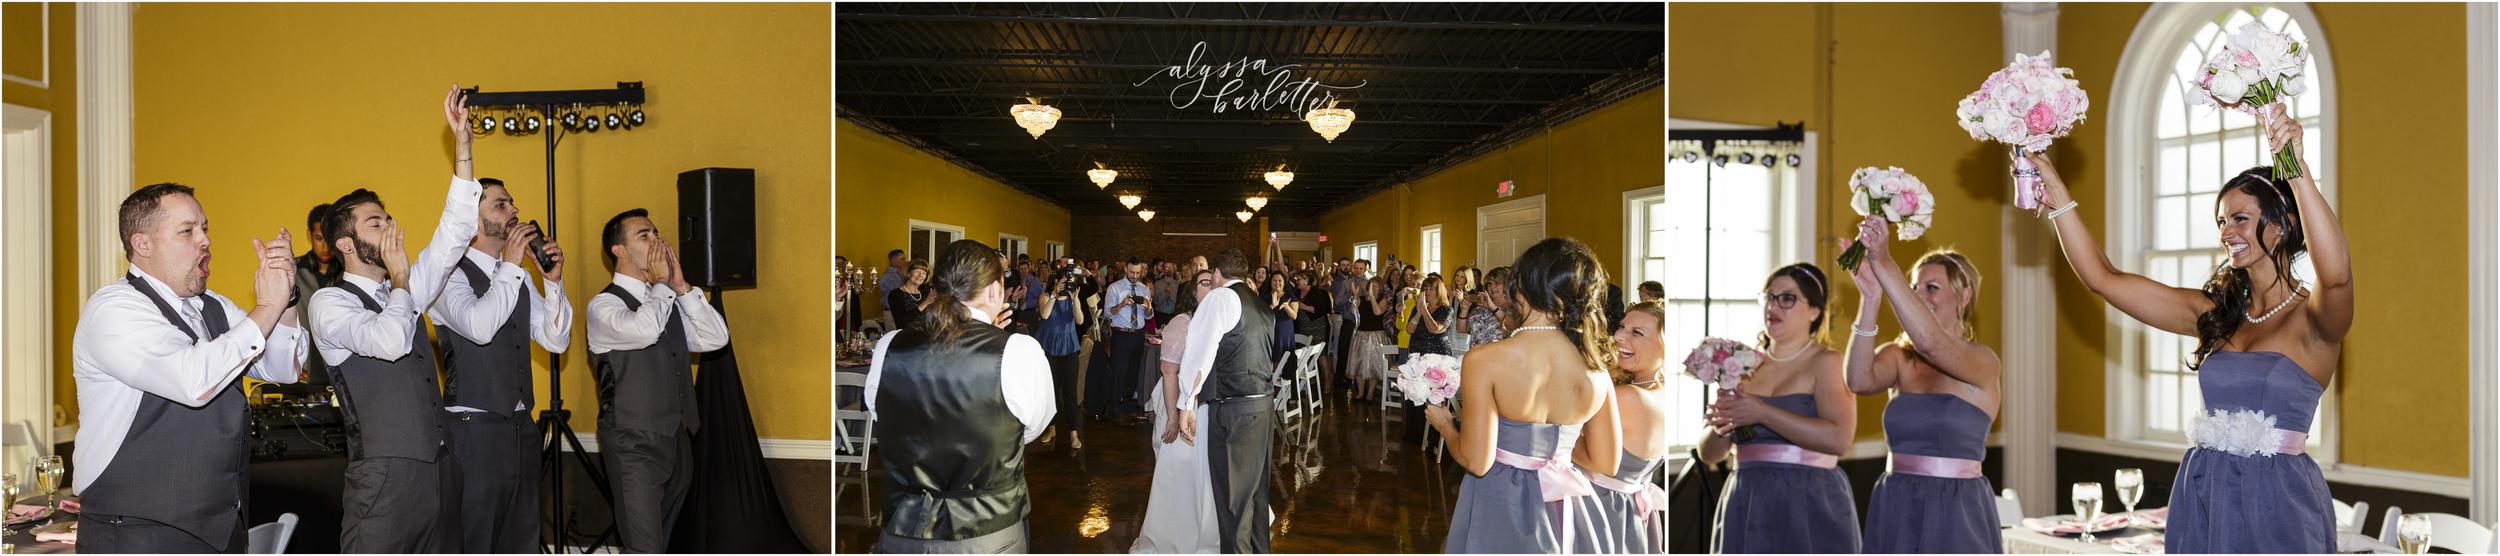 the deleon kansas city wedding photos-24.jpg